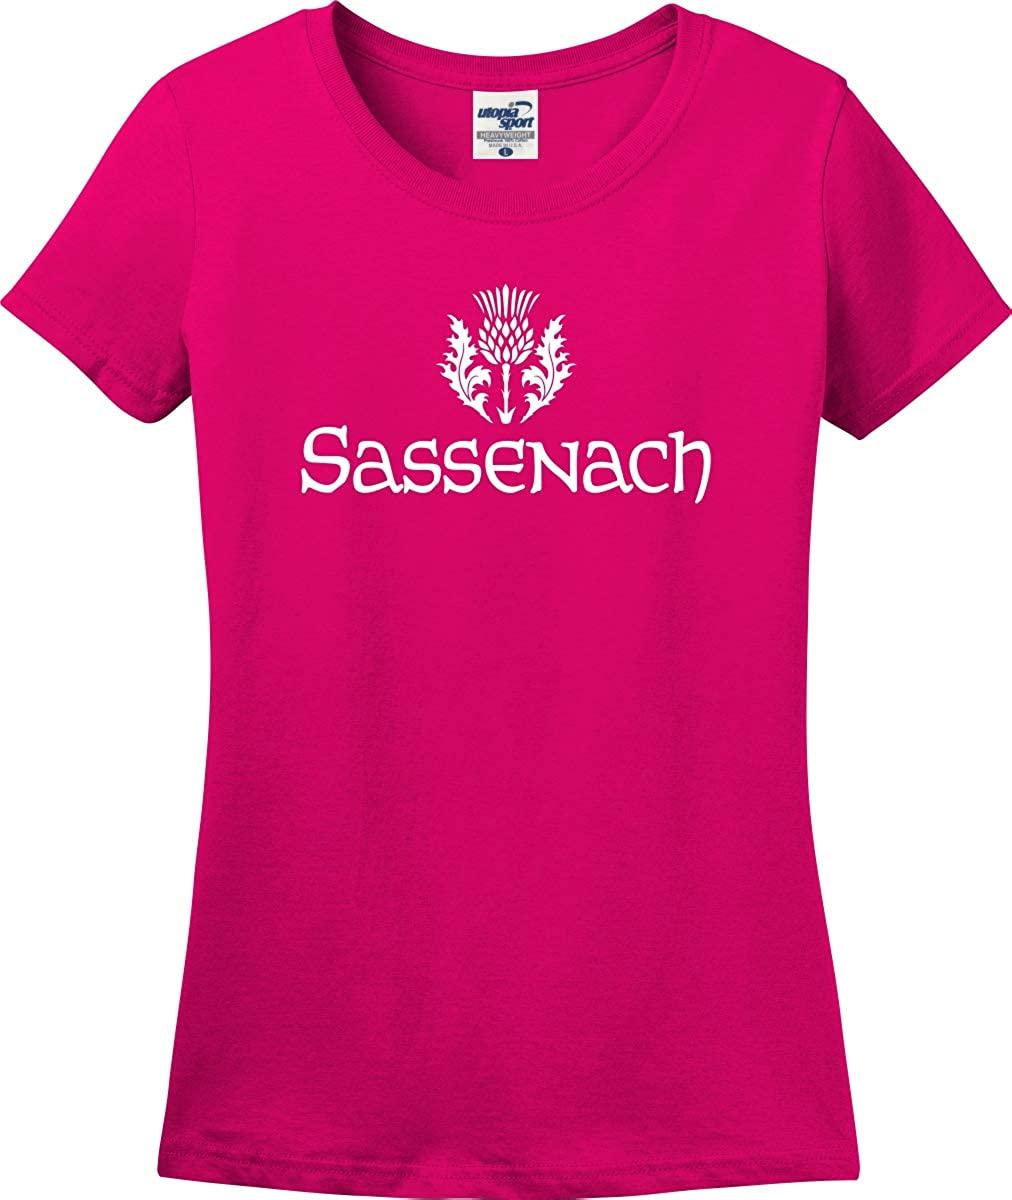 Sassenach Thistle Missy Fit Ladies T-Shirt (S-3X)